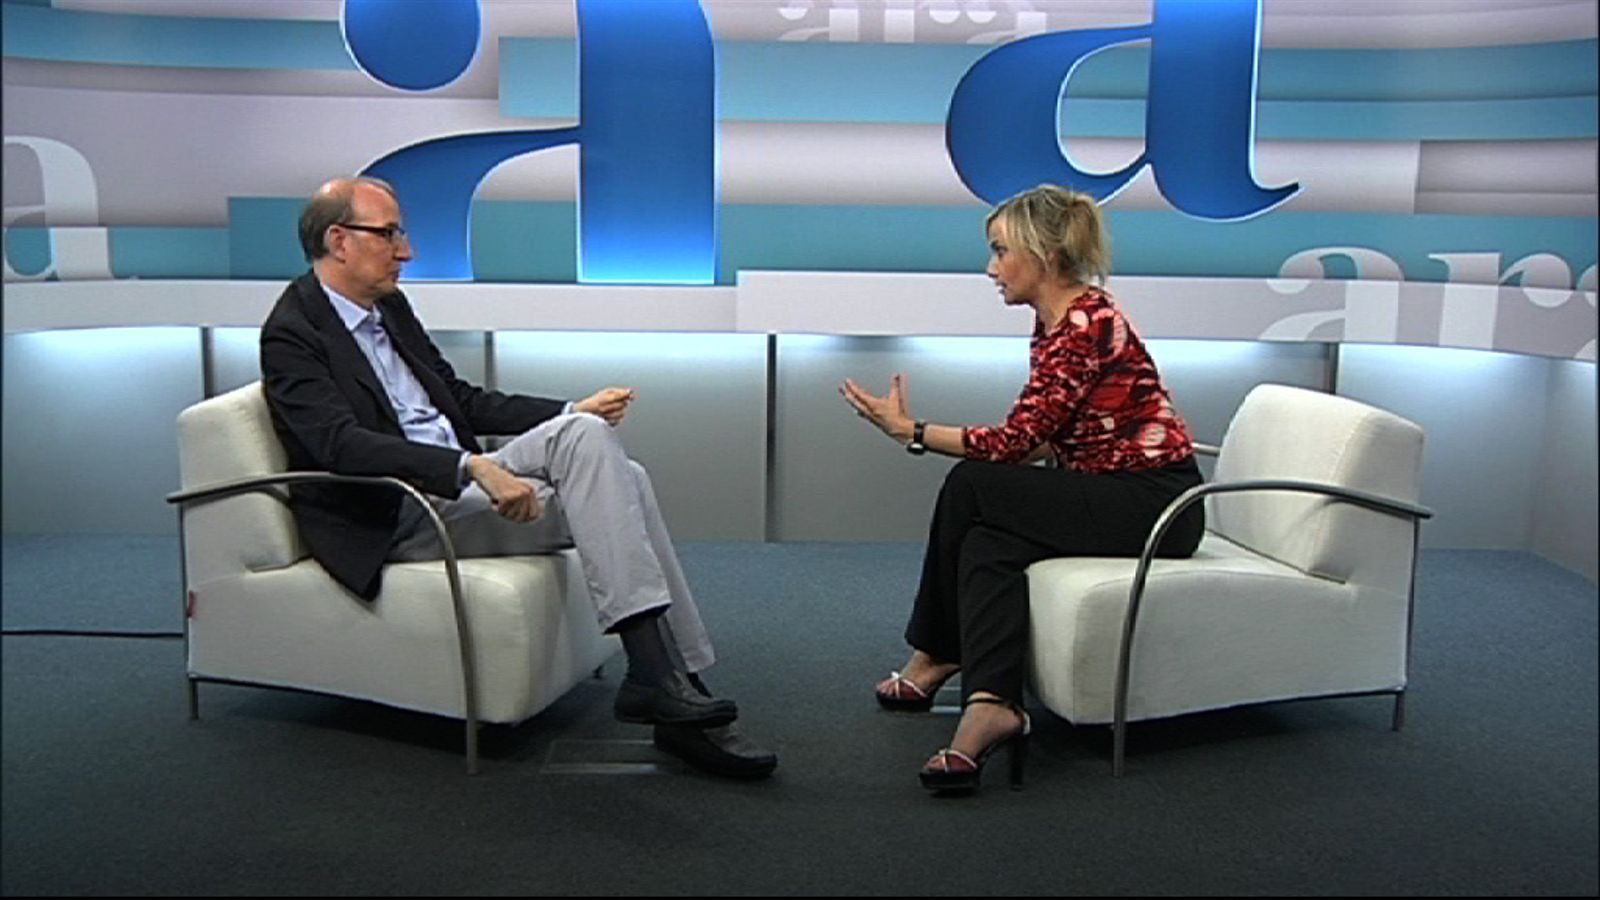 Entrevista de Mònica Terribas a Antoni Bassas